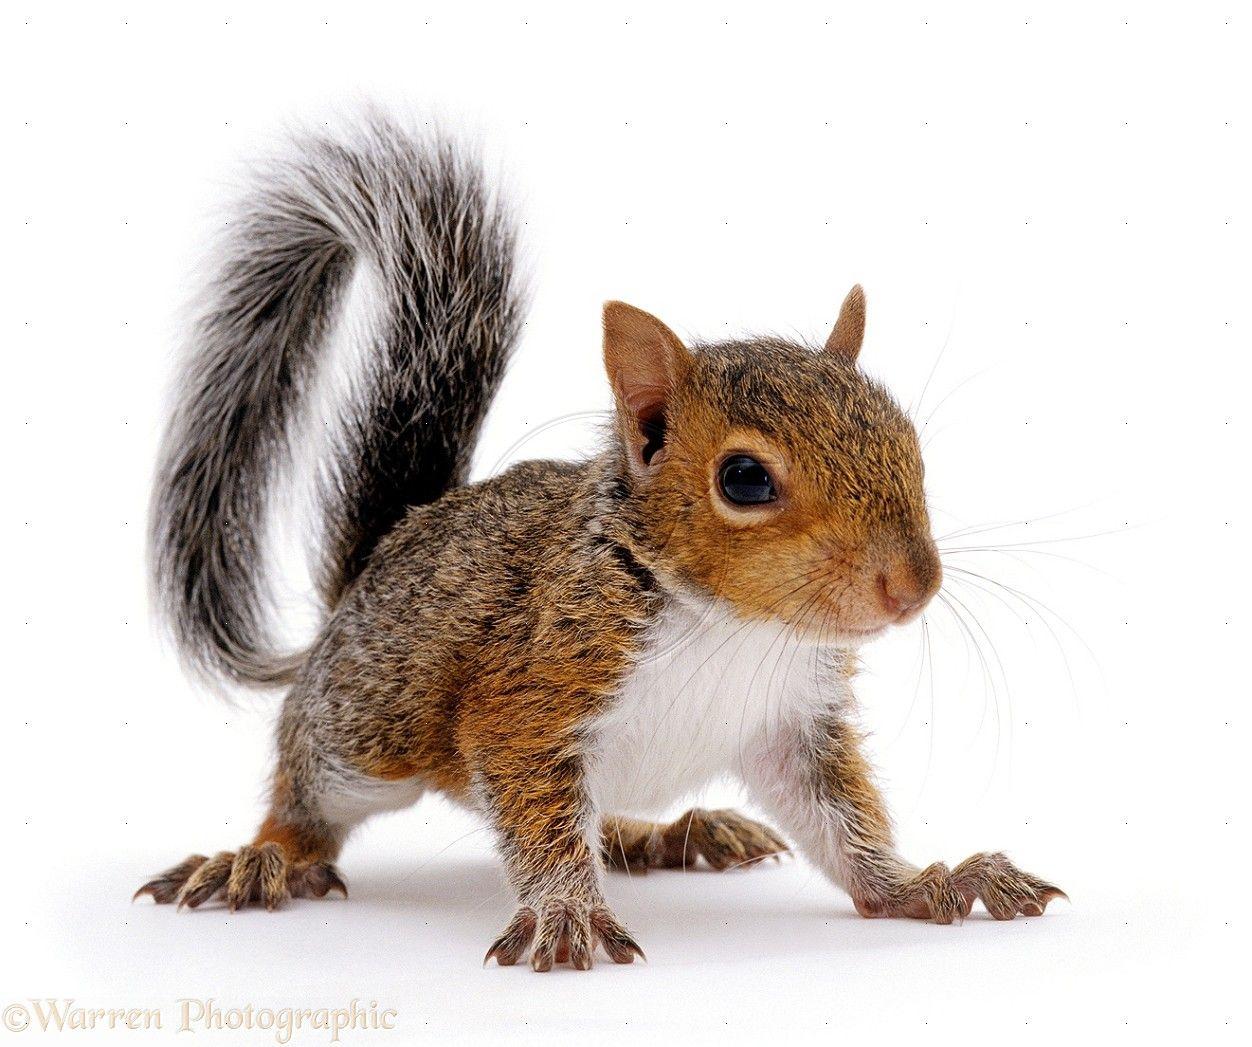 gray squirrel wallpaper - photo #21